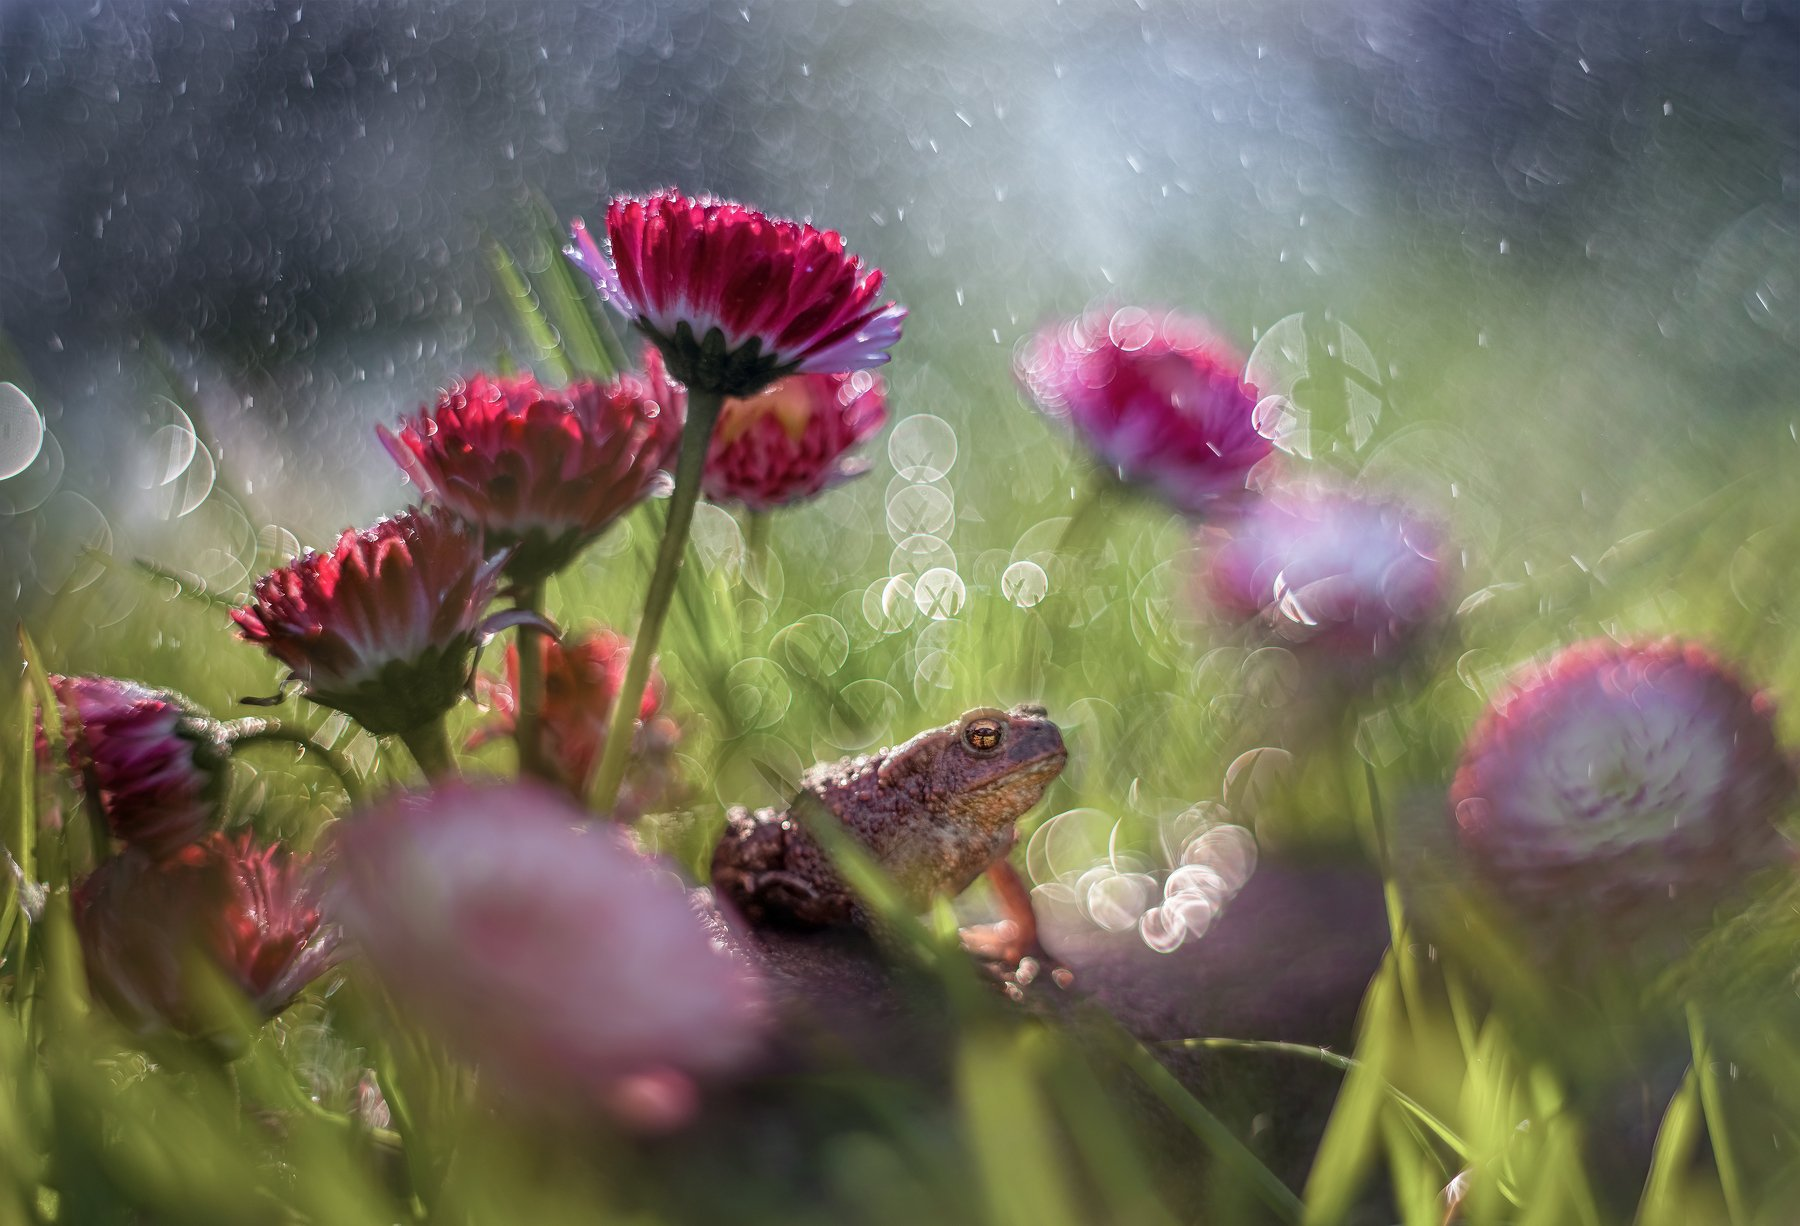 лягушка цветы боке макро красота маргаритки трава, Третьякова Анастасия